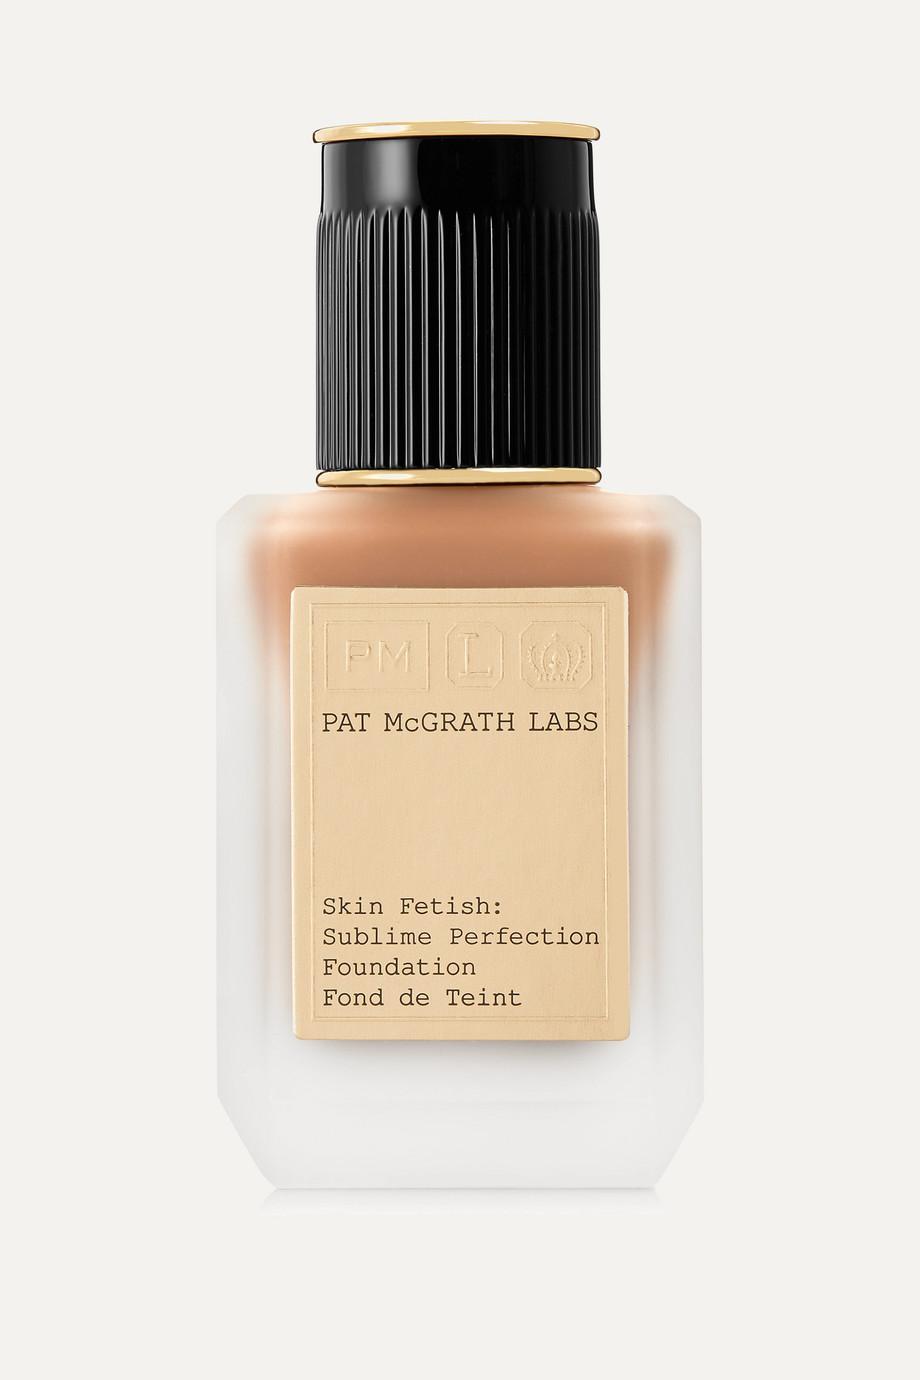 Pat McGrath Labs Skin Fetish: Sublime Perfection Foundation – Medium 19, 35 ml – Foundation